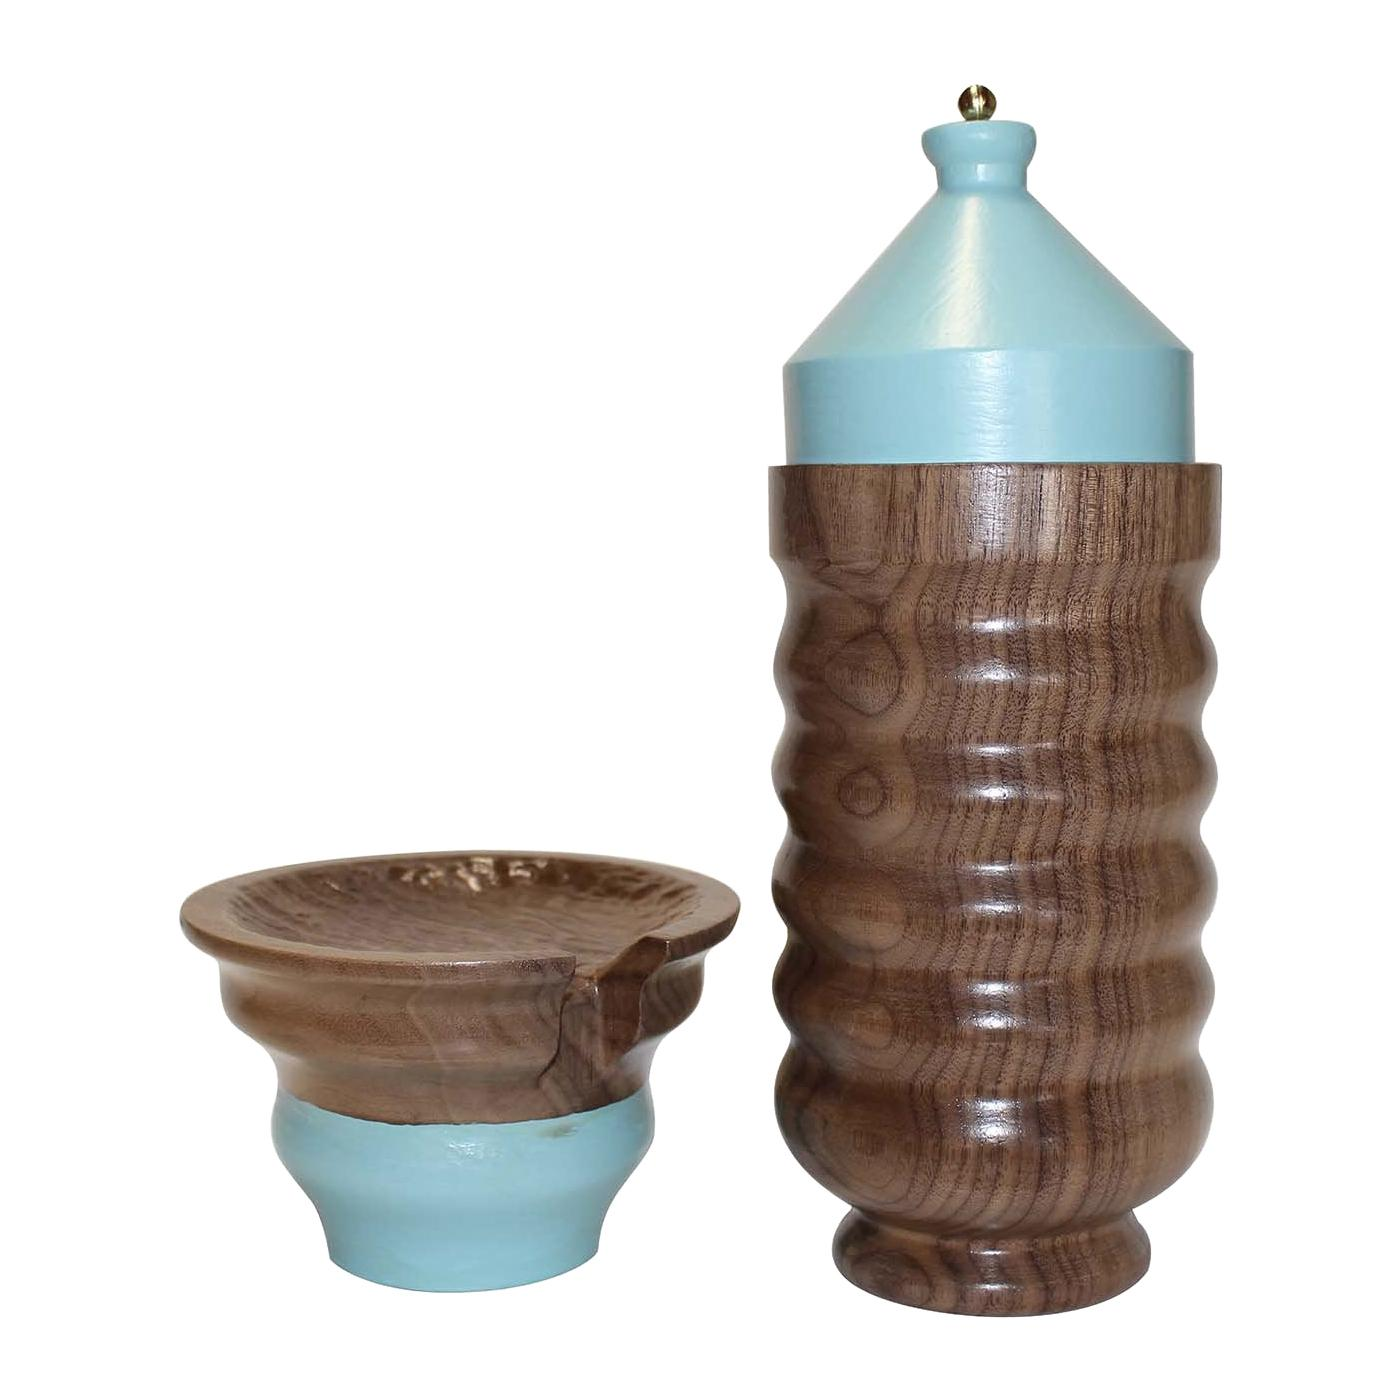 Acquamarina Sculptural Object